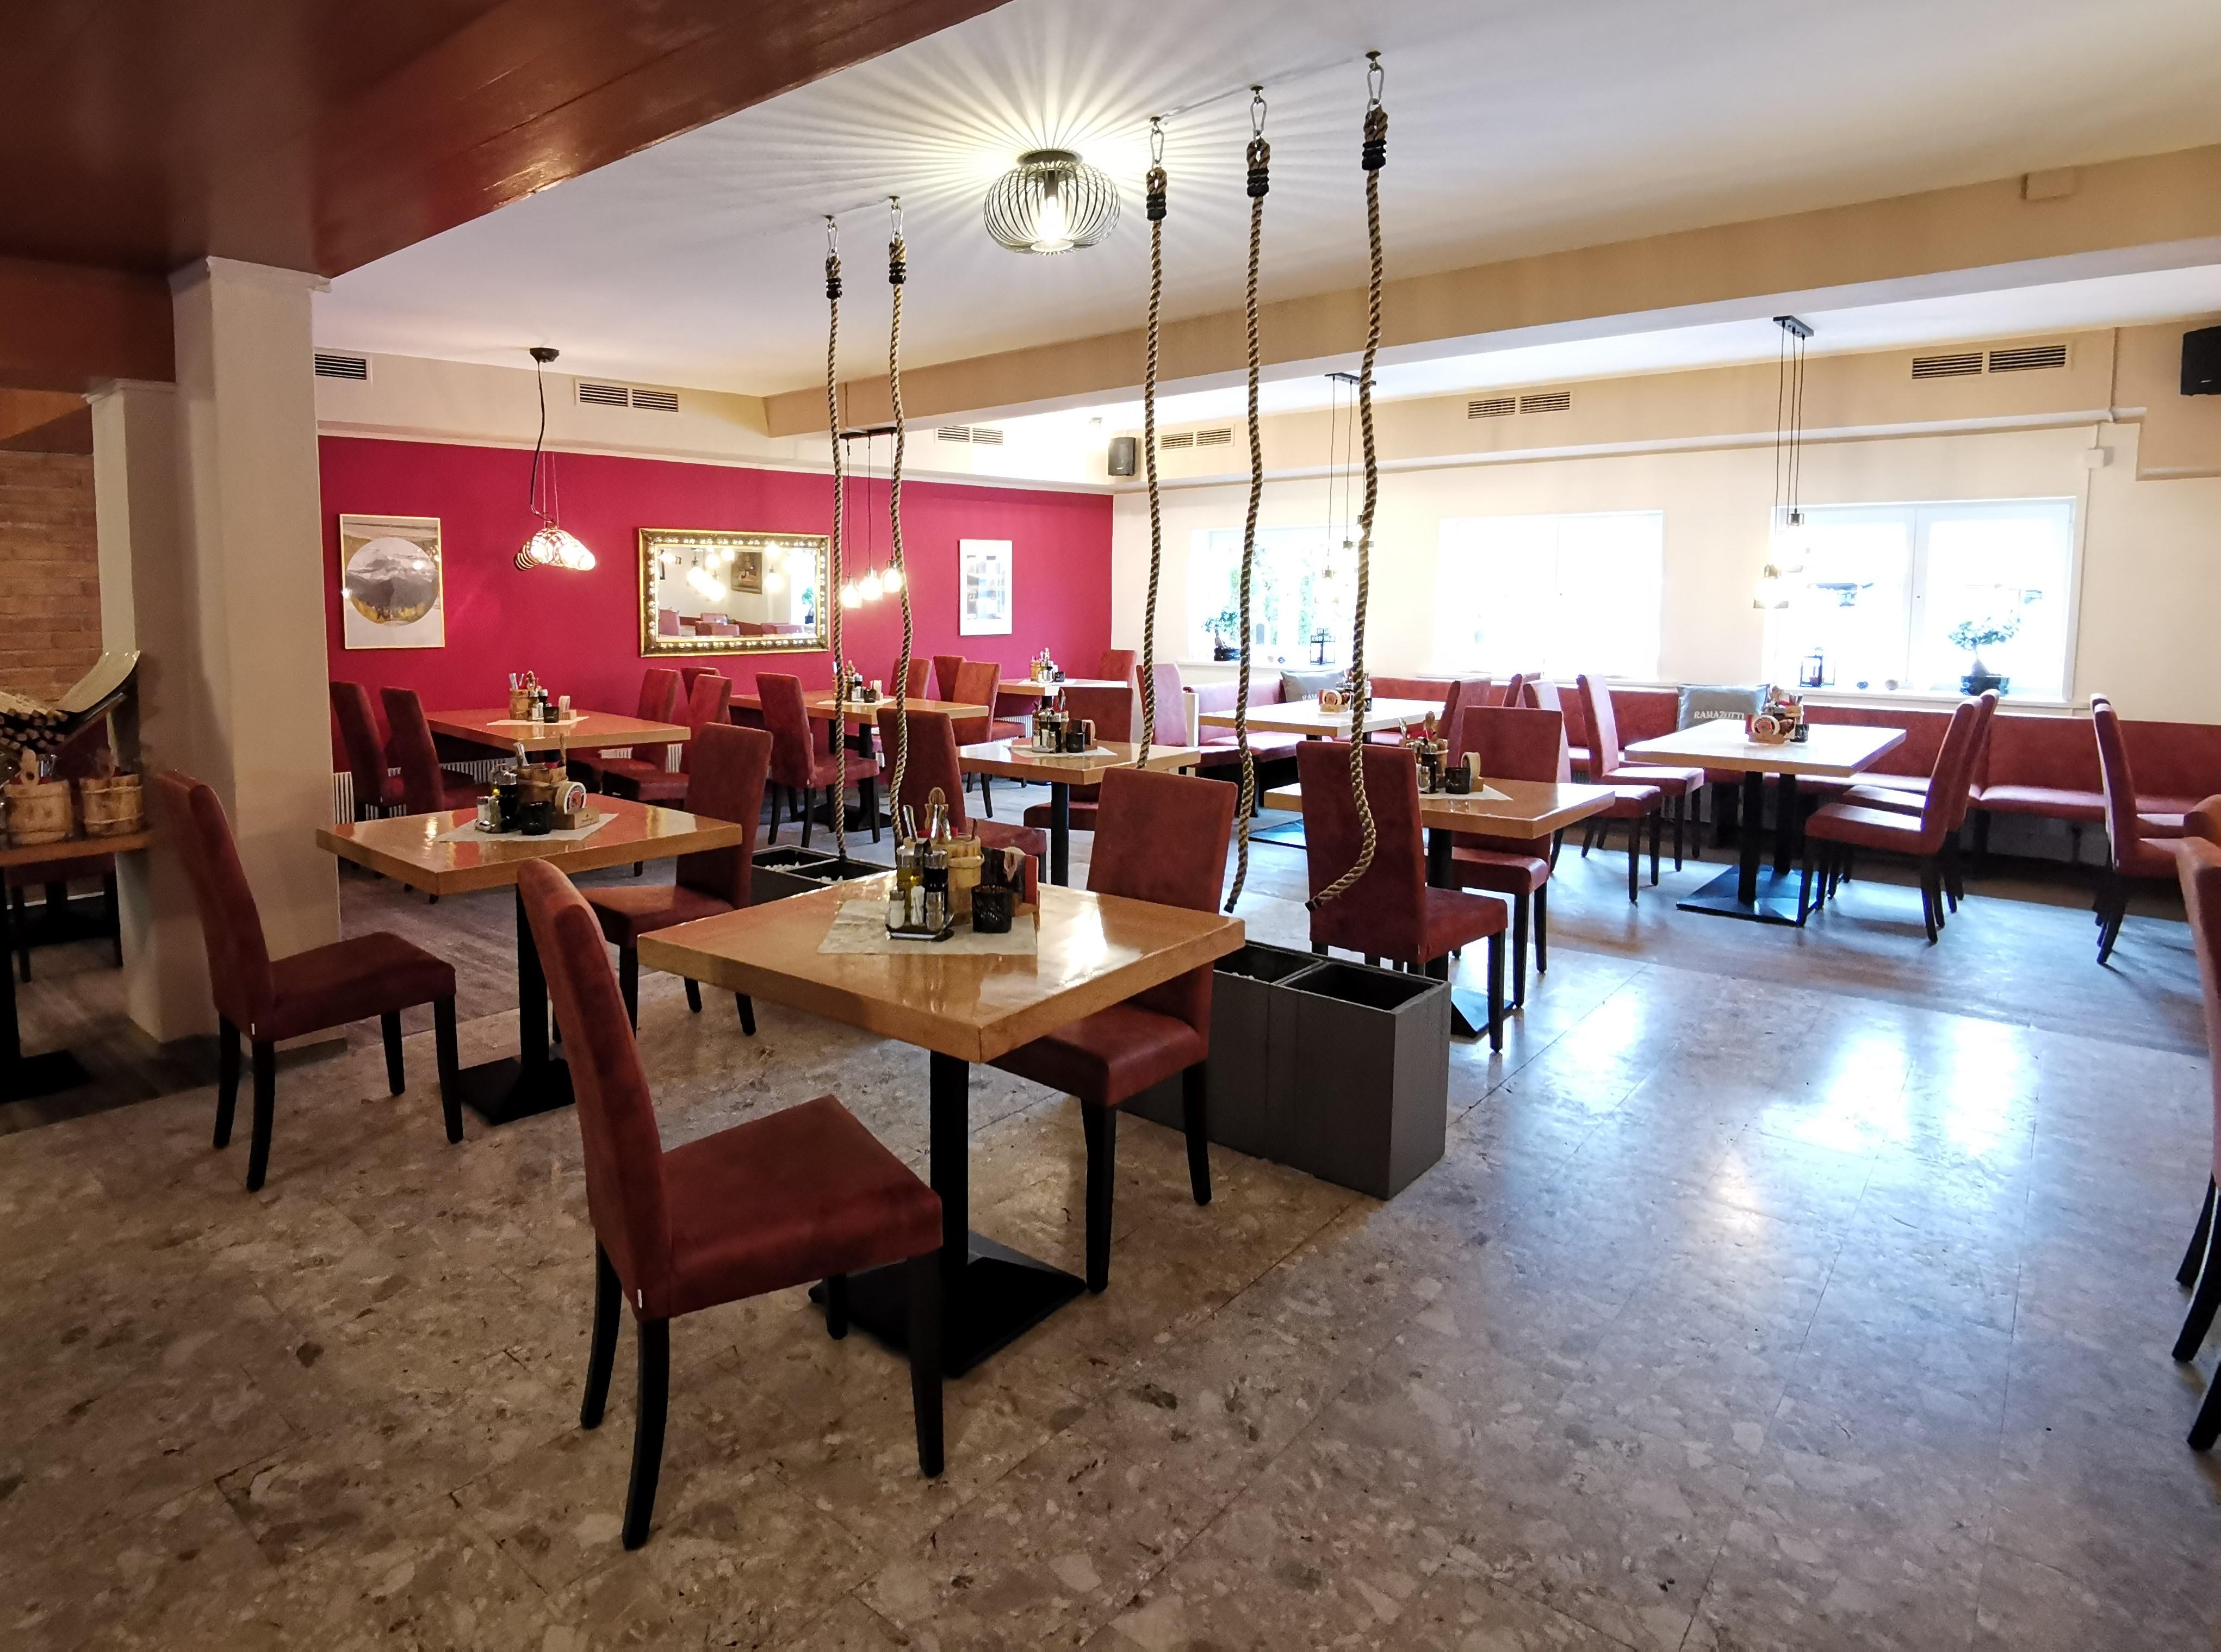 restaurantstuehle-polsterstuehle-rela-vintage-rostfarben-rd04-2